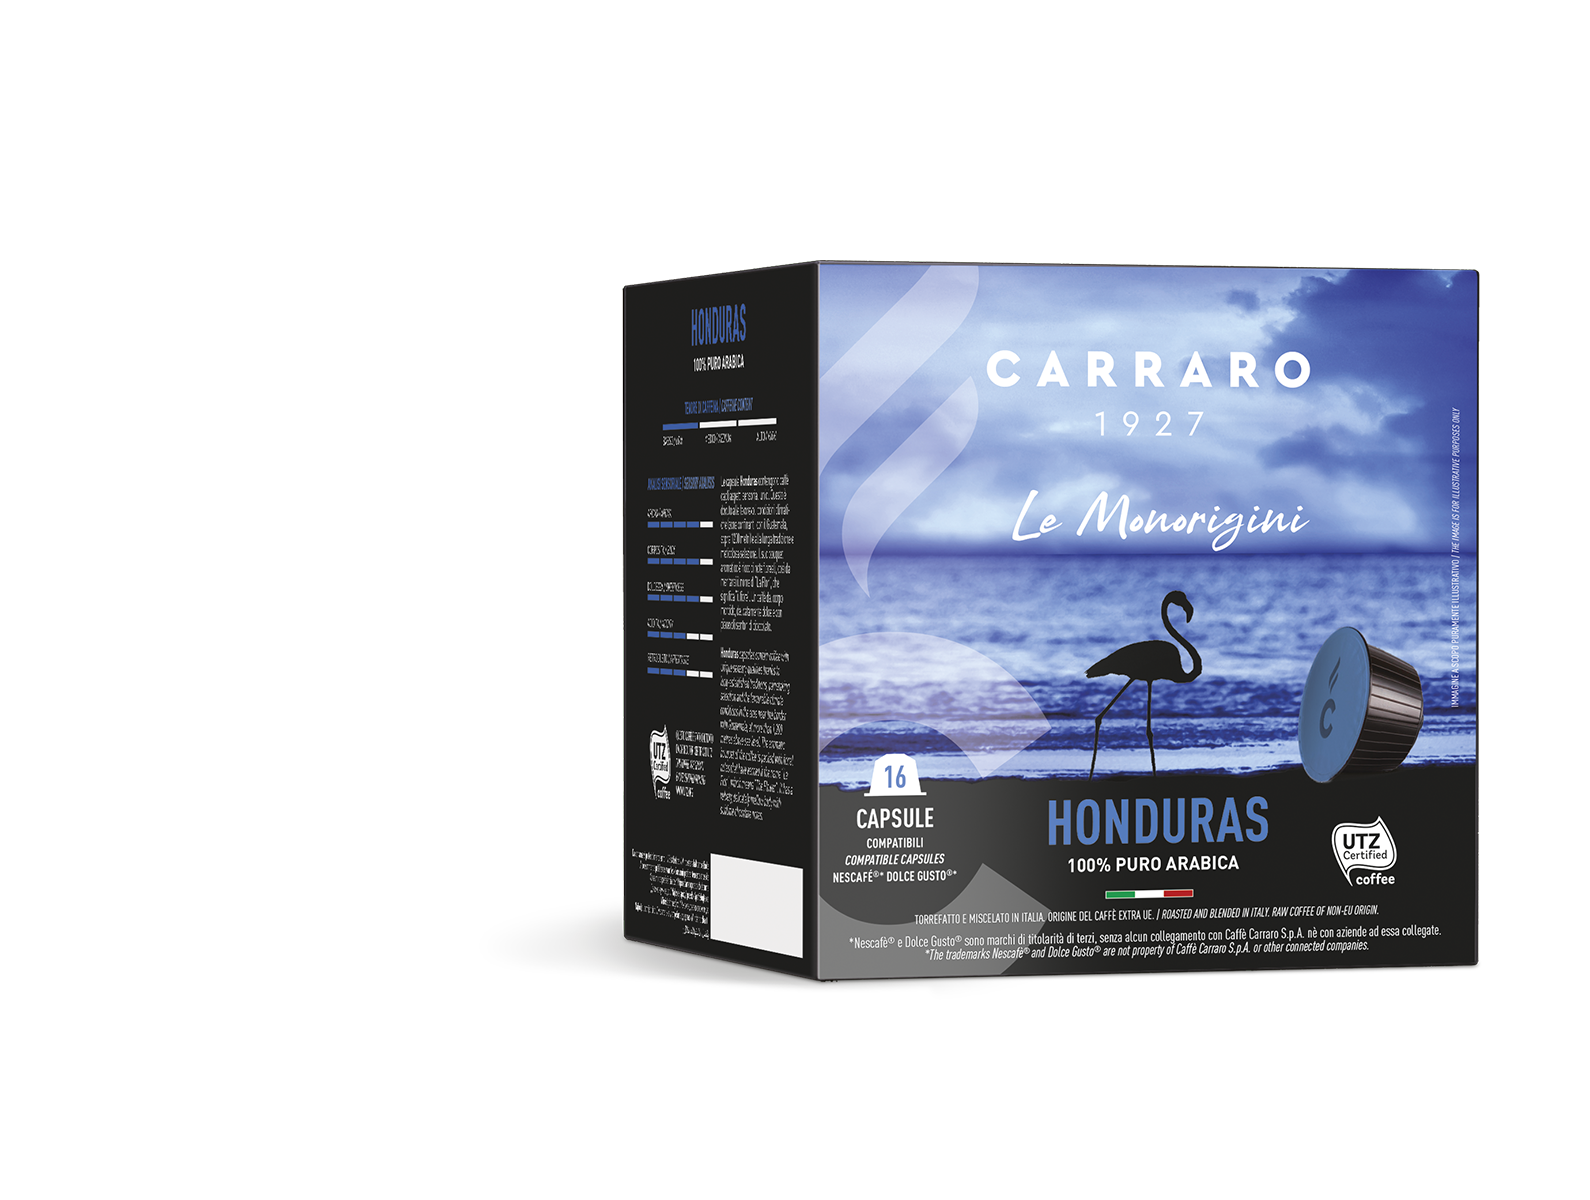 Honduras – 16 capsules